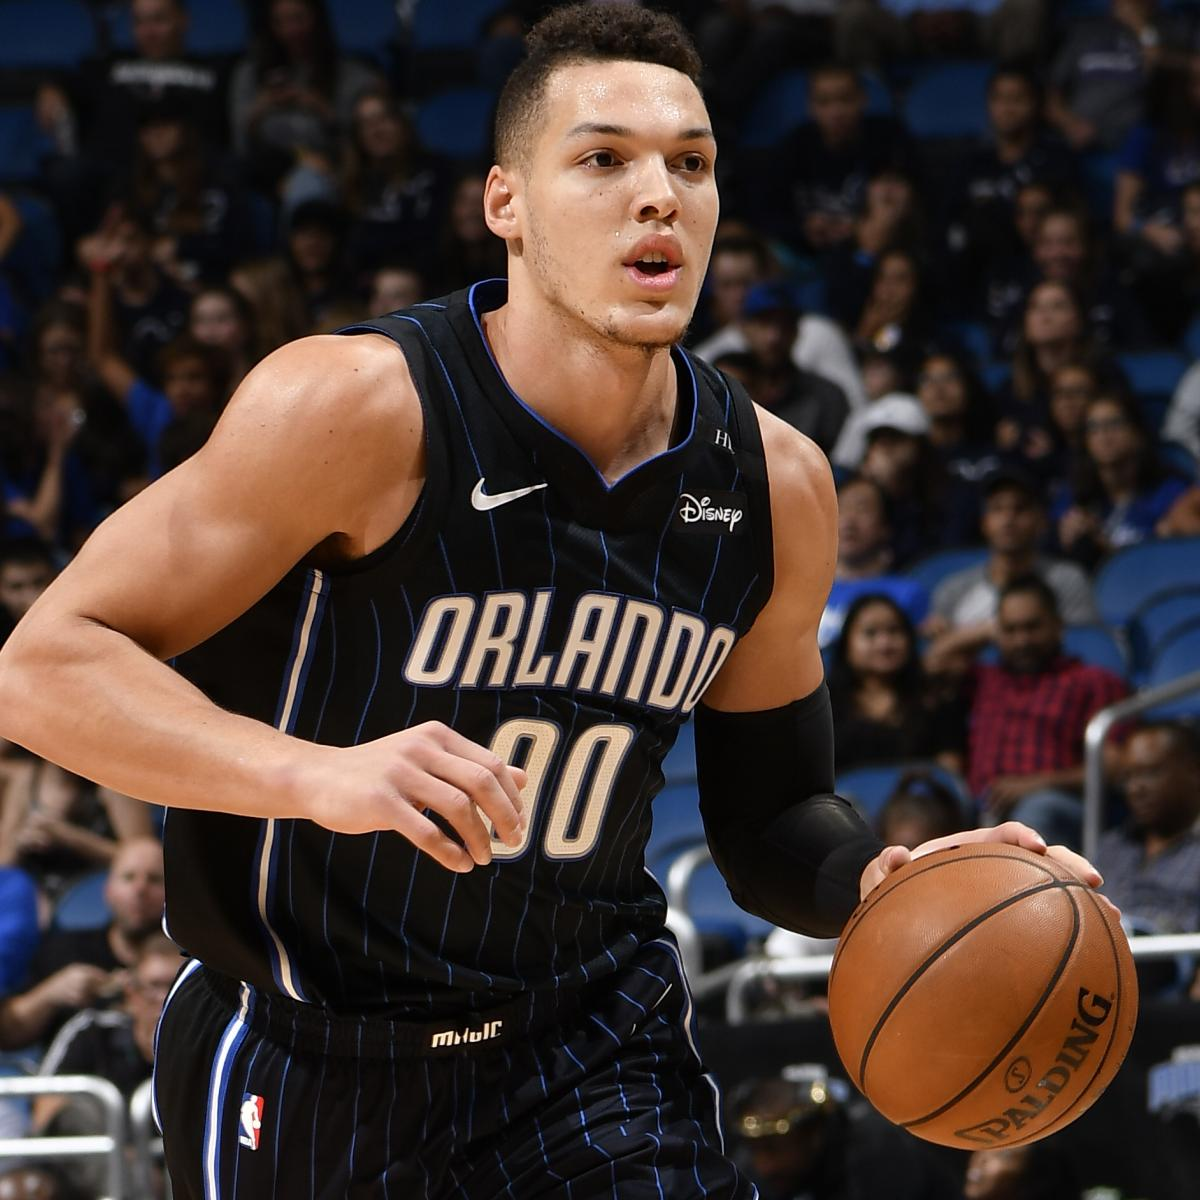 Shooting Range Orlando >> Aaron Gordon Not Moved by Magic Before 2018 NBA Trade ...